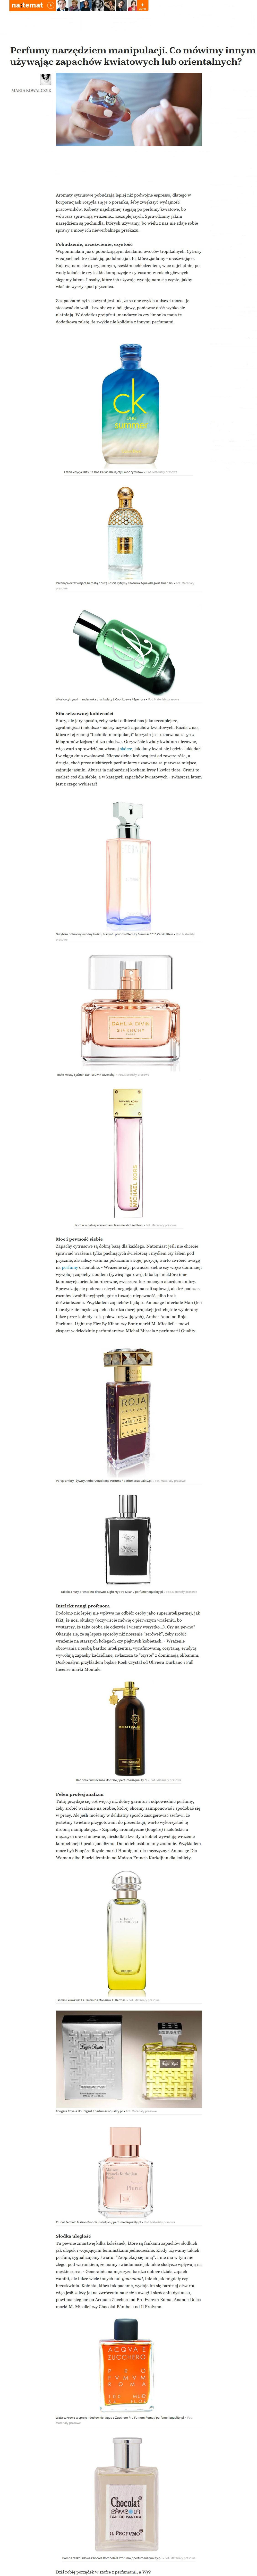 2015.06.29_NaTemat.pl ROJA PARFUMS Amber Aoud, KILIAN Light my Fire, MONTALE Full Incense, HOUBIGANT Fougere Royale, MFK Pluriel feminin, PRO FVMVM ROMA Aqua e Zucchero, IL PROFVMO Chocolat Bambola